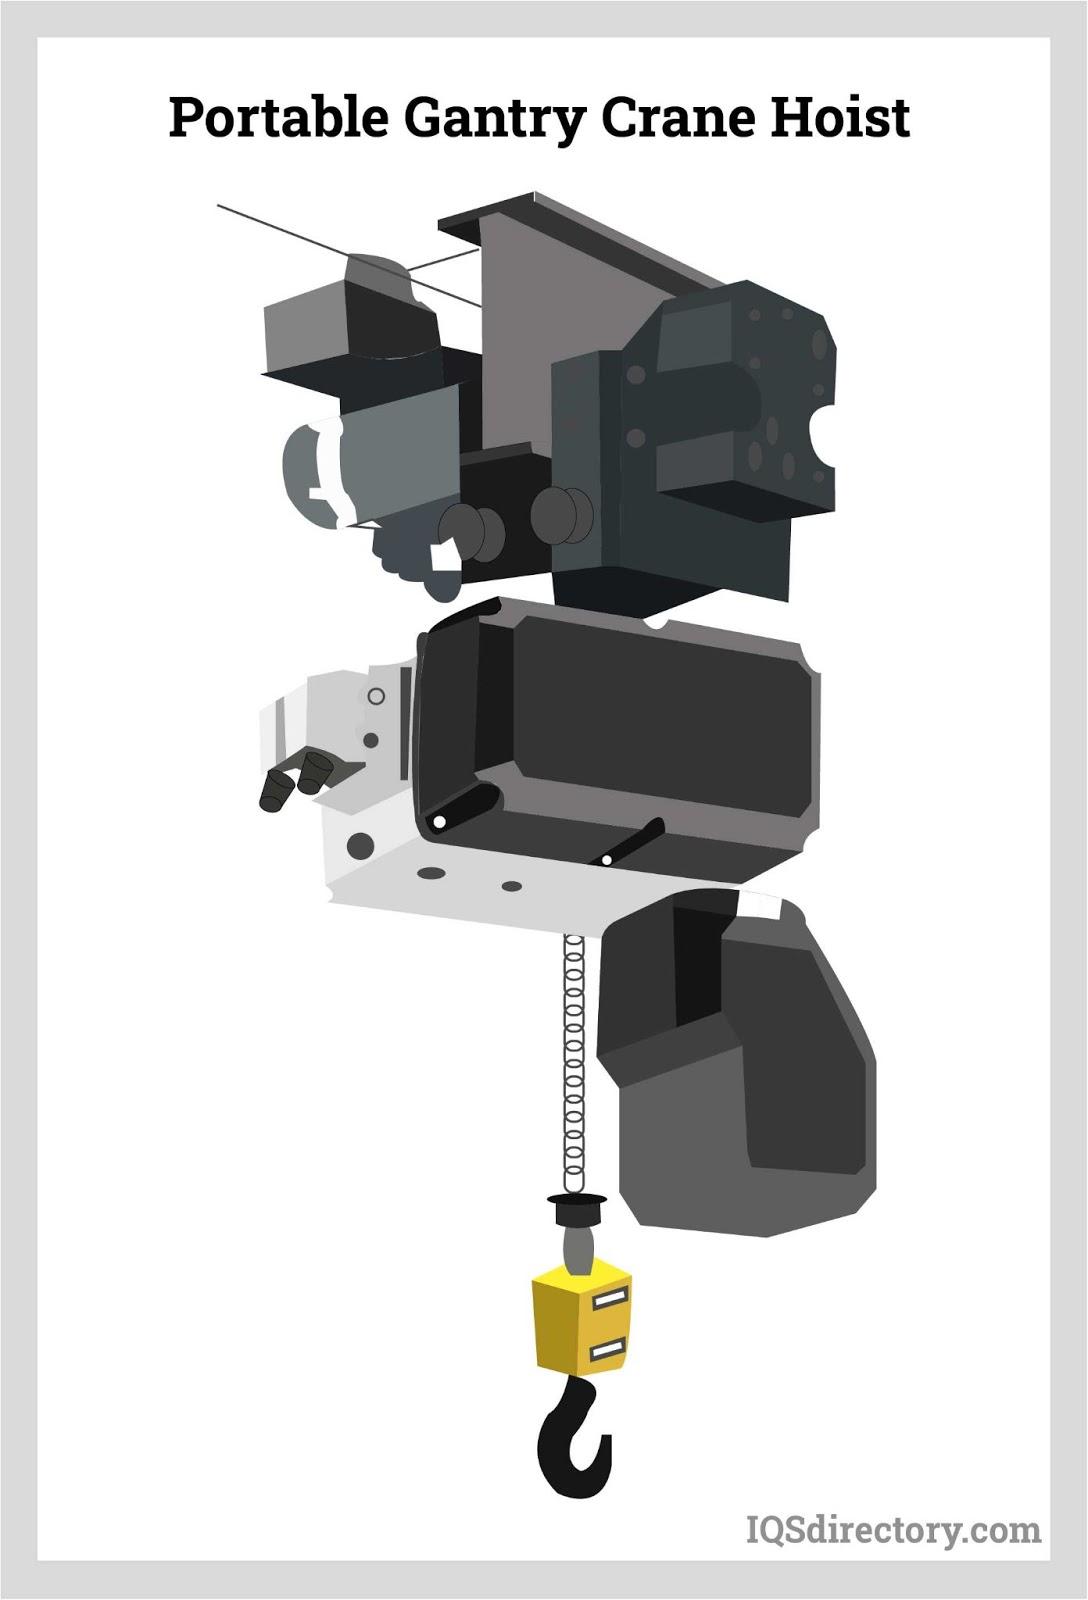 Portable Gantry Crane Hoist